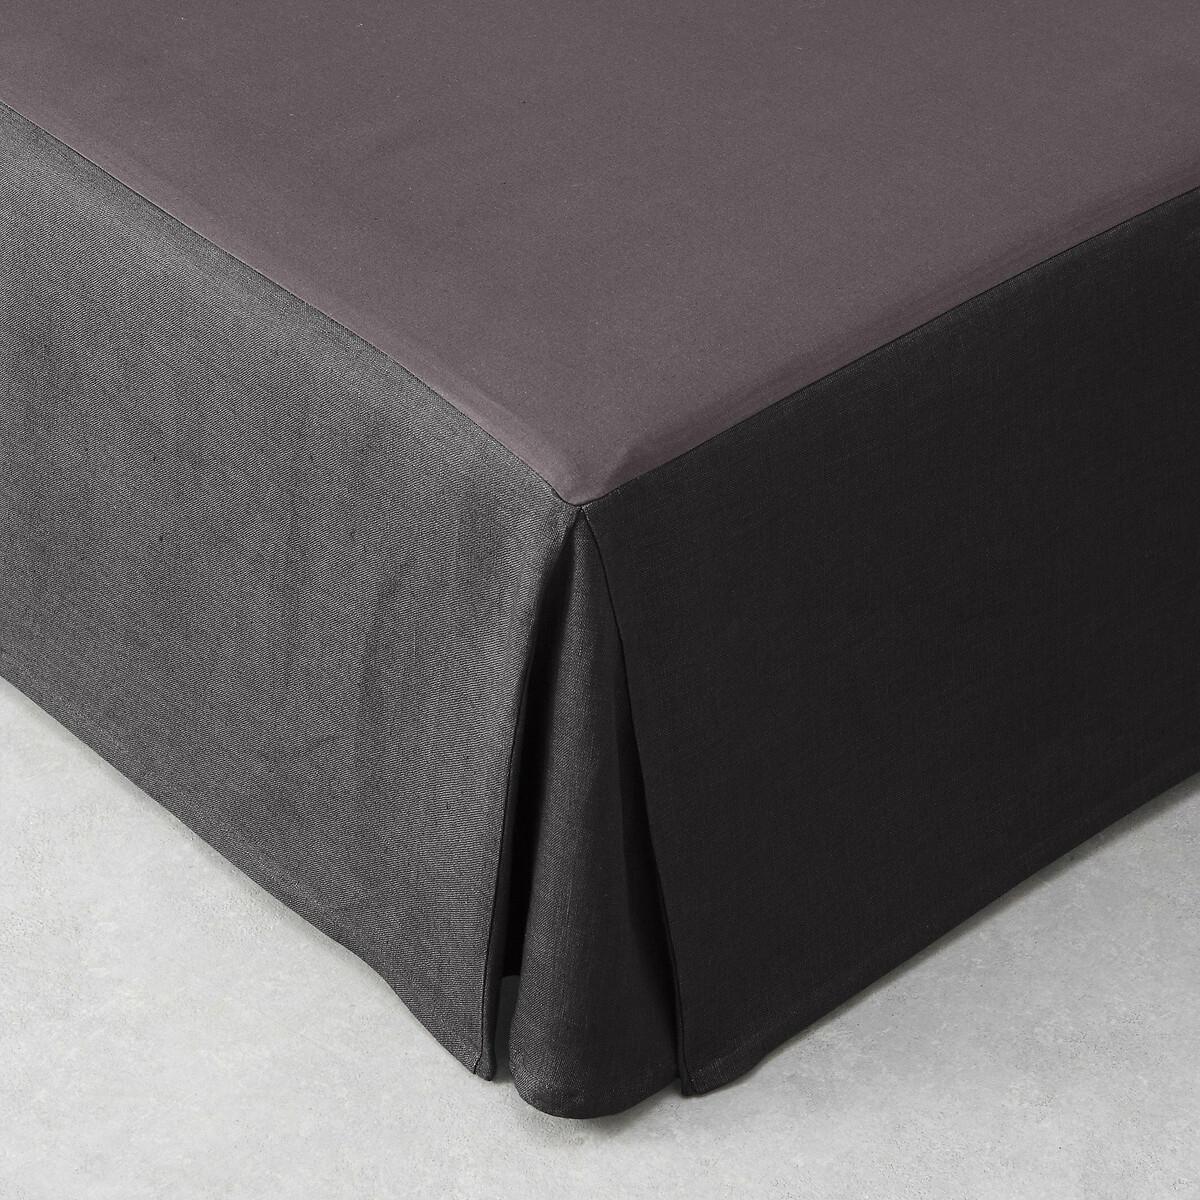 Чехол LaRedoute Для кровати из льна Touril 90 x 190 см серый чехол laredoute для кровати 100 льна 160 x 200 см белый